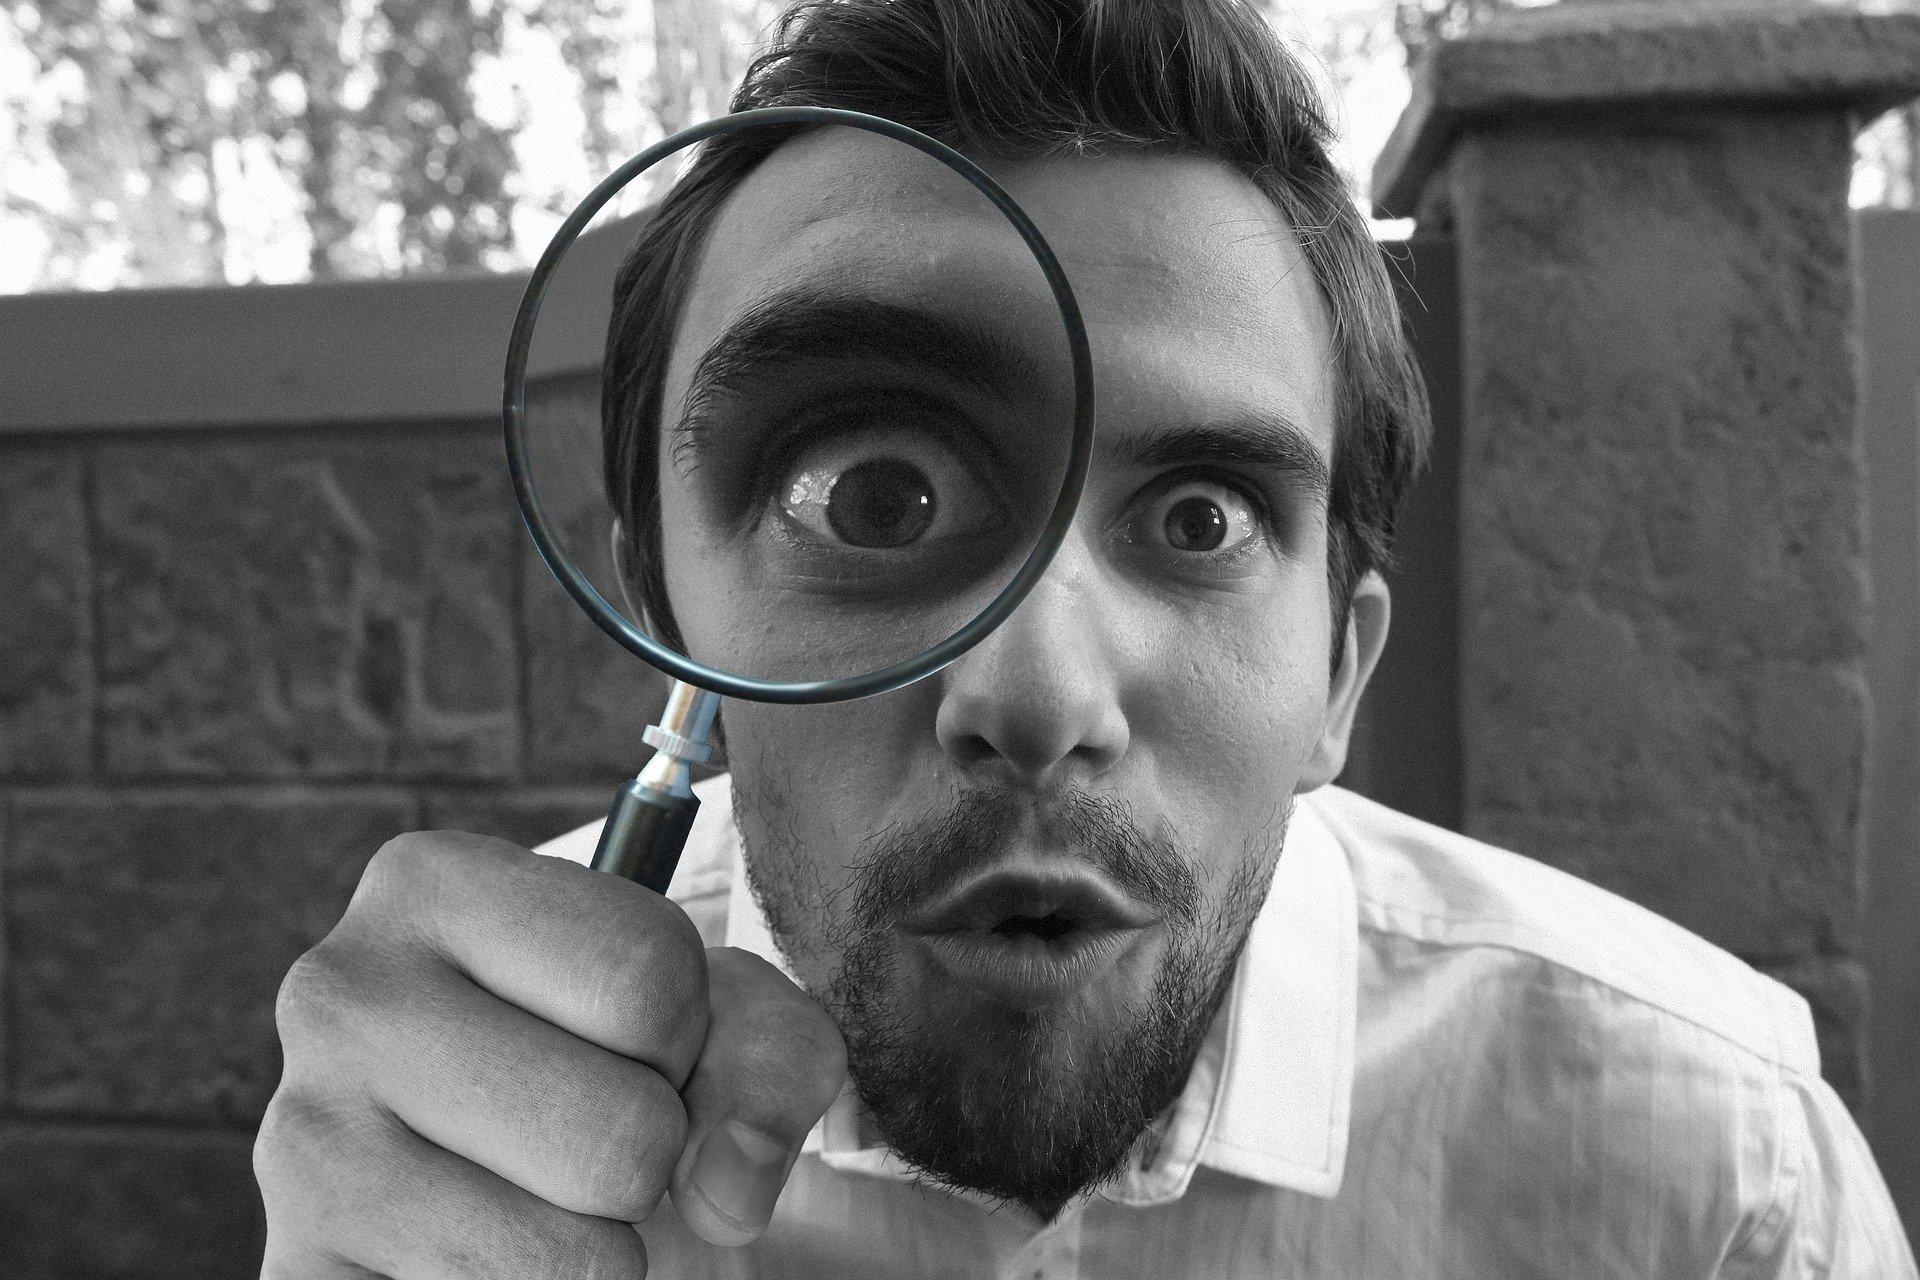 detective che indaga con lente d'ingrandimento